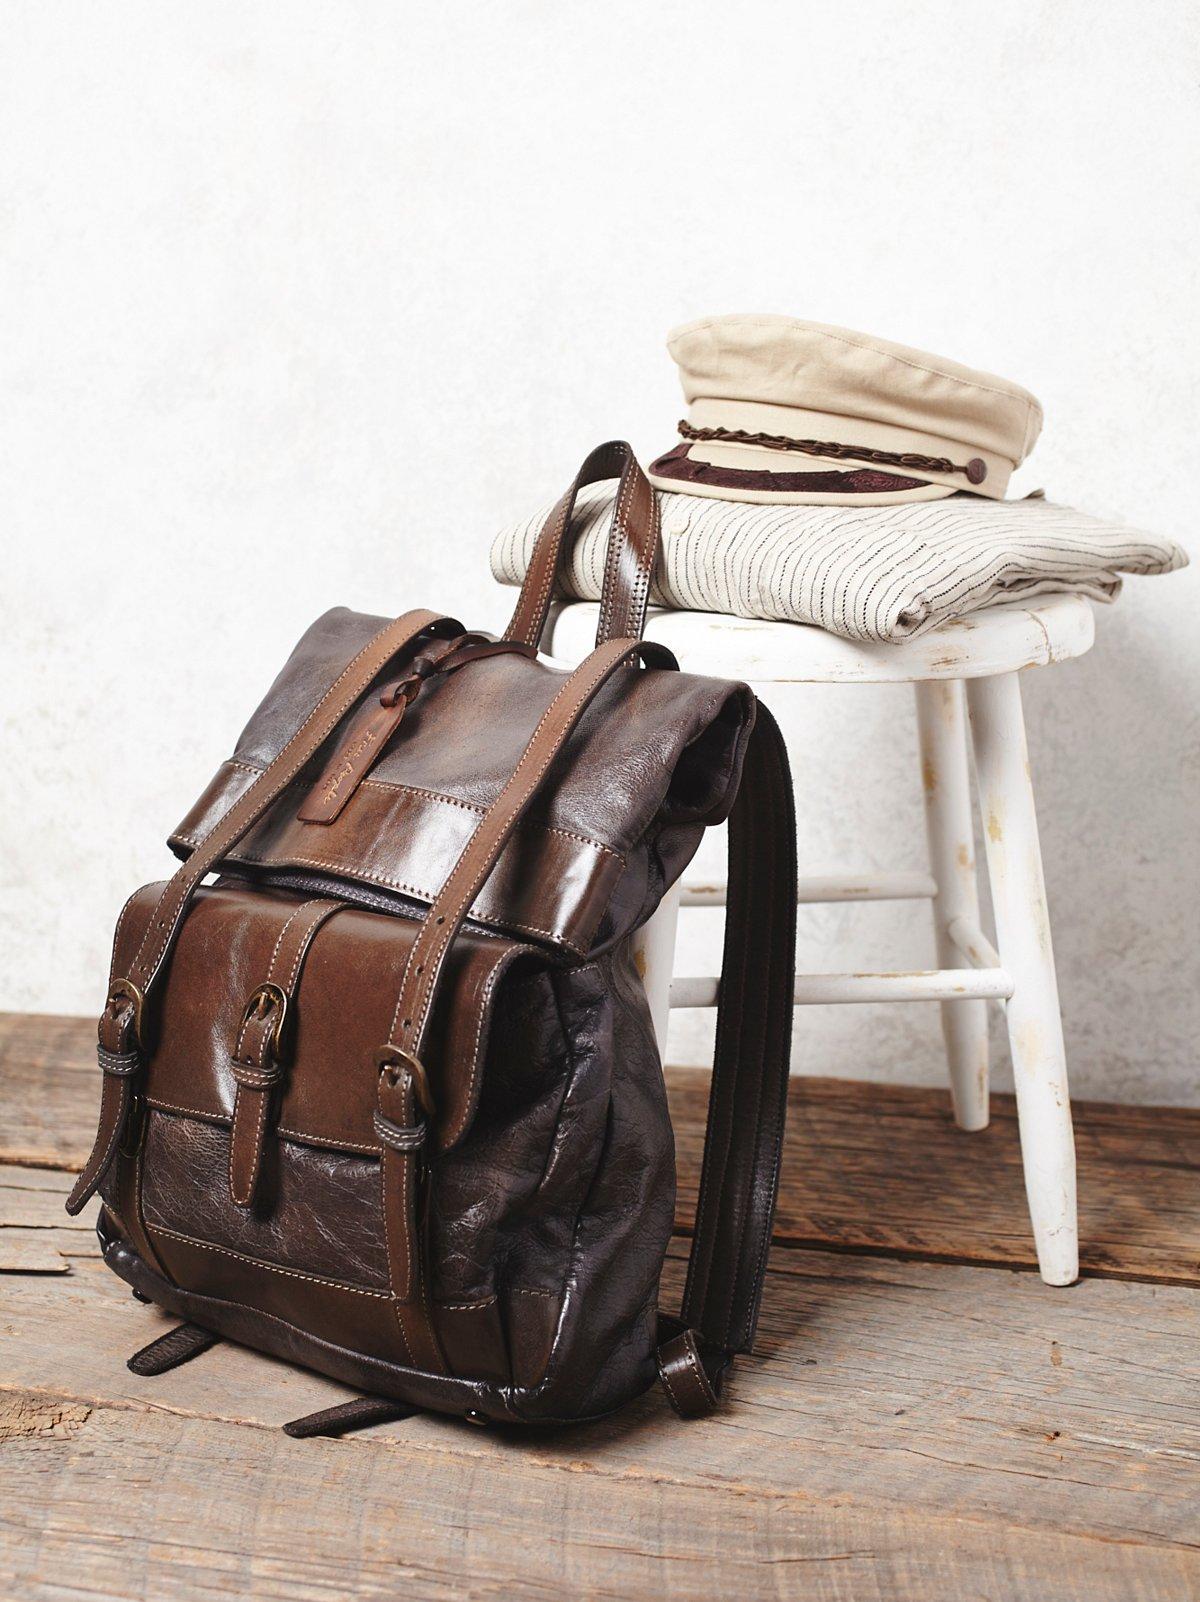 Romero背包